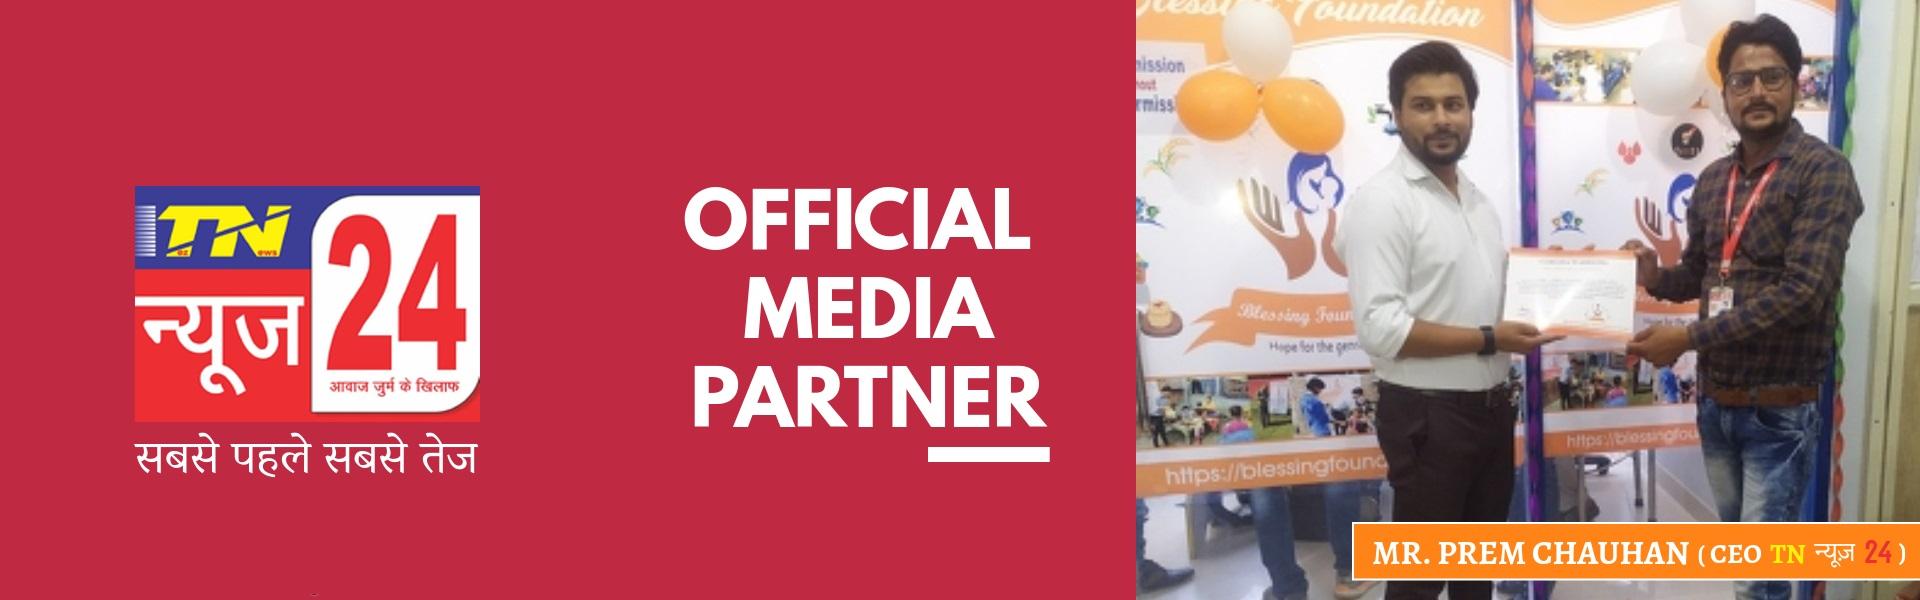 tnnews24_सबसे पहले सबसे तेज_official_media_partner_with_blessing_foundation_agra